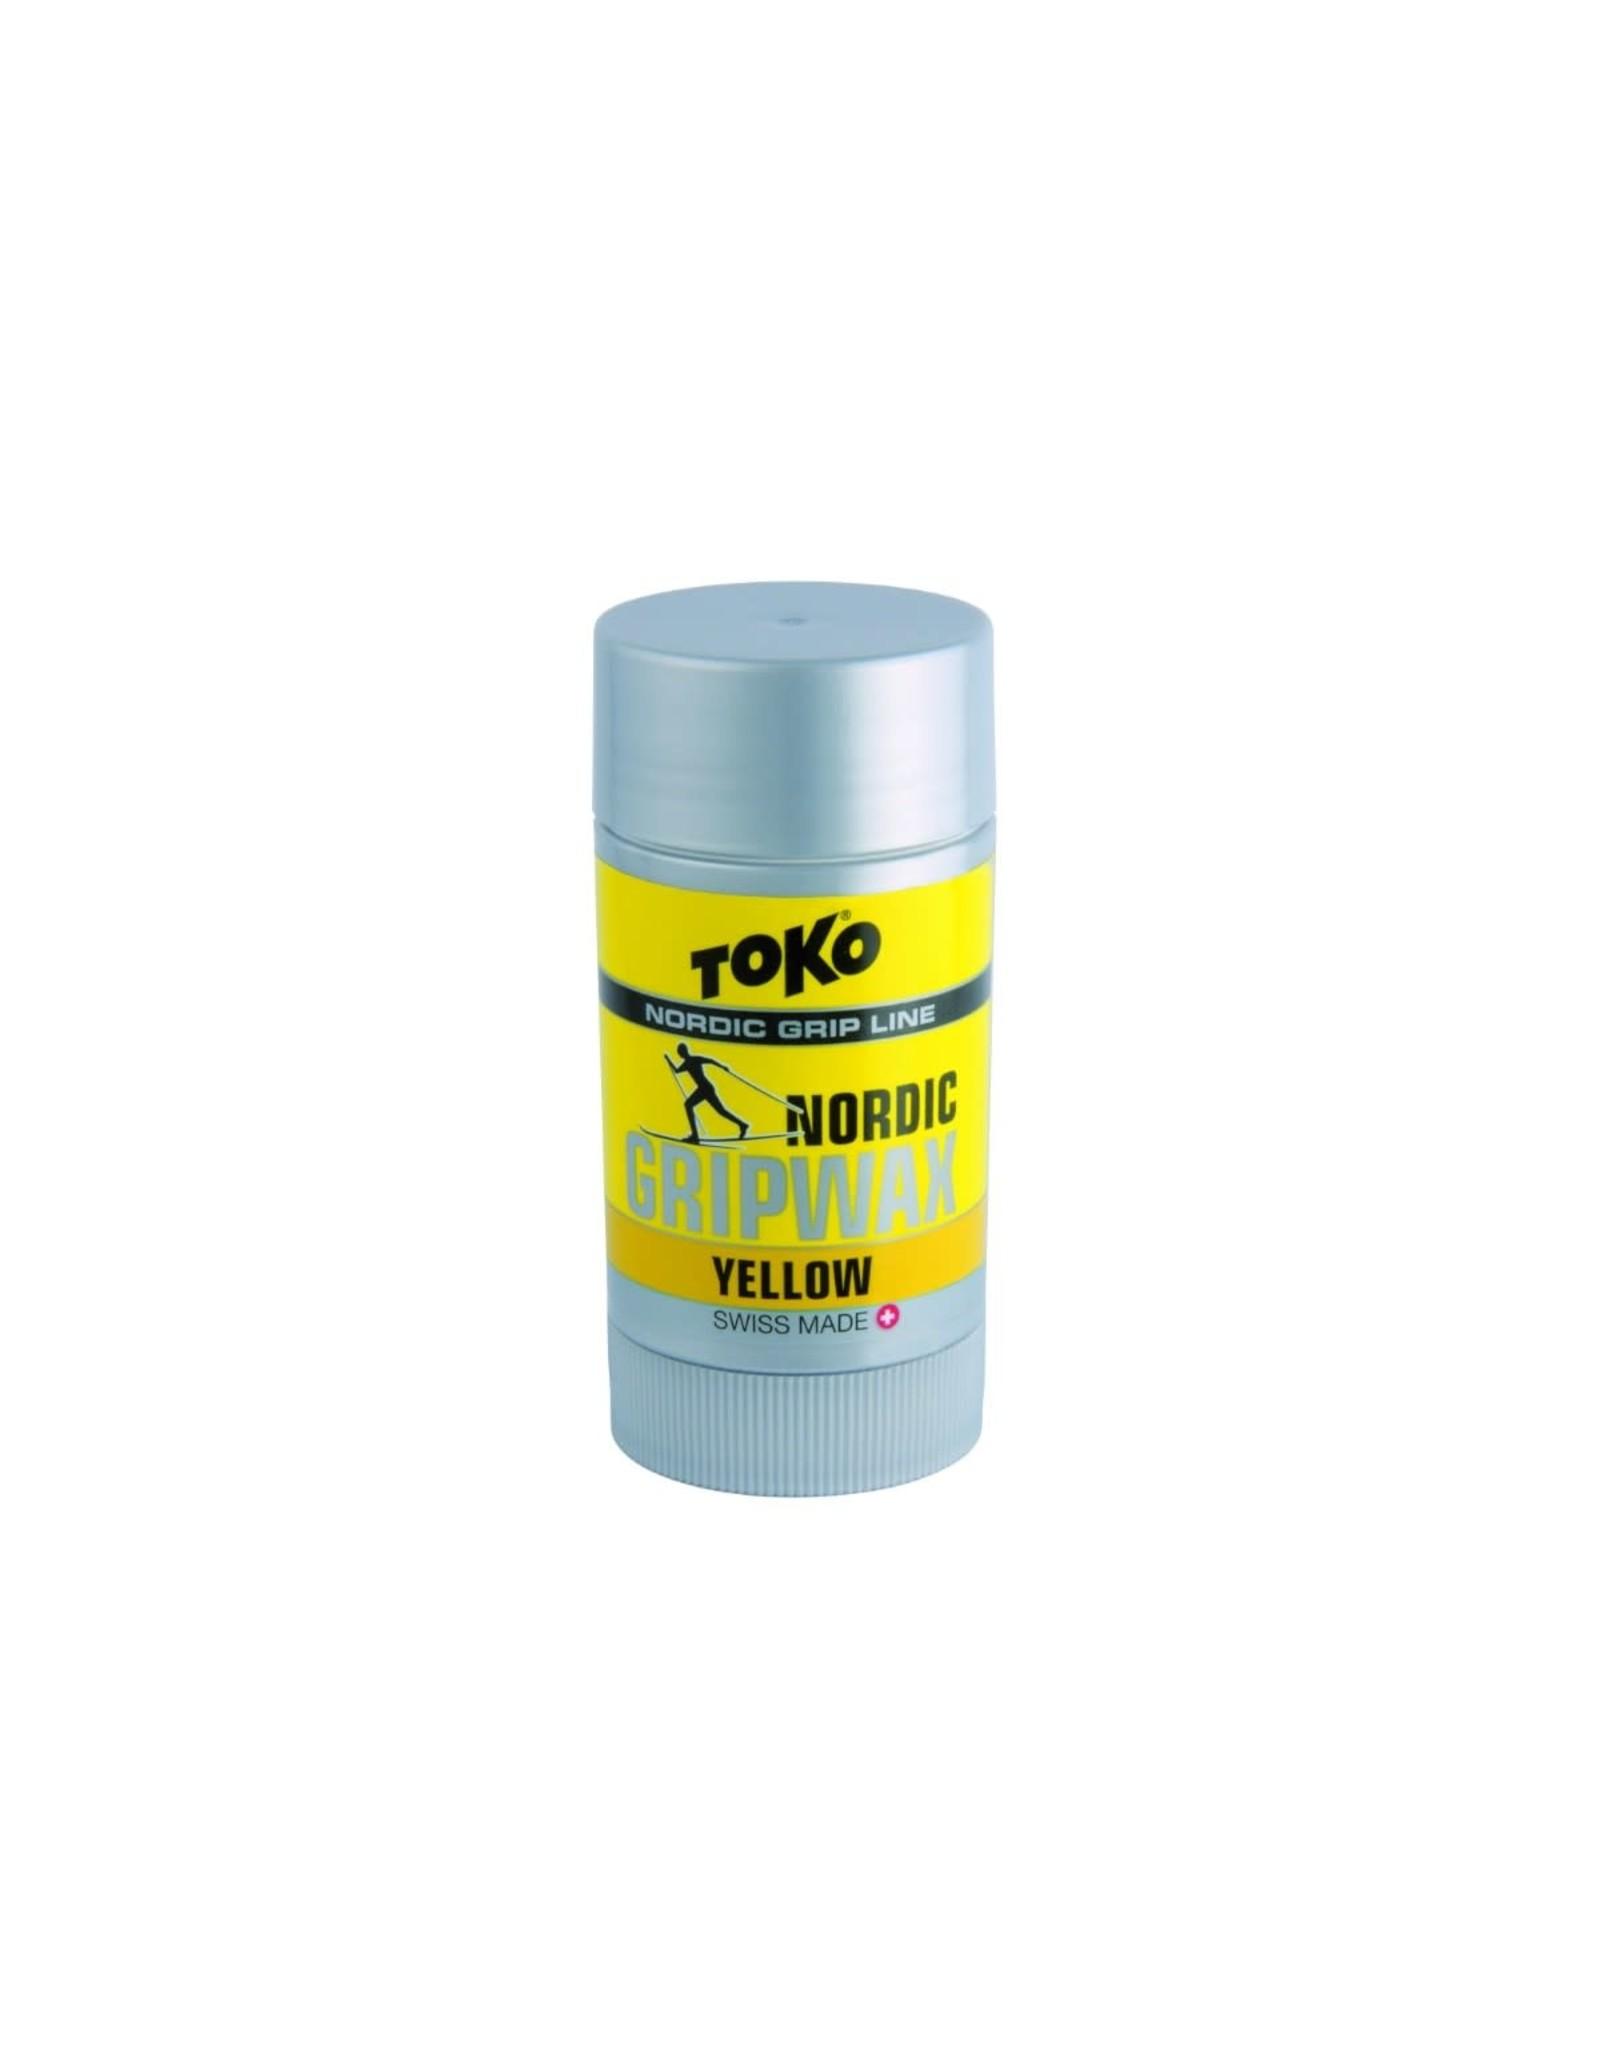 Toko Toko Nordic Grip Wax Yellow